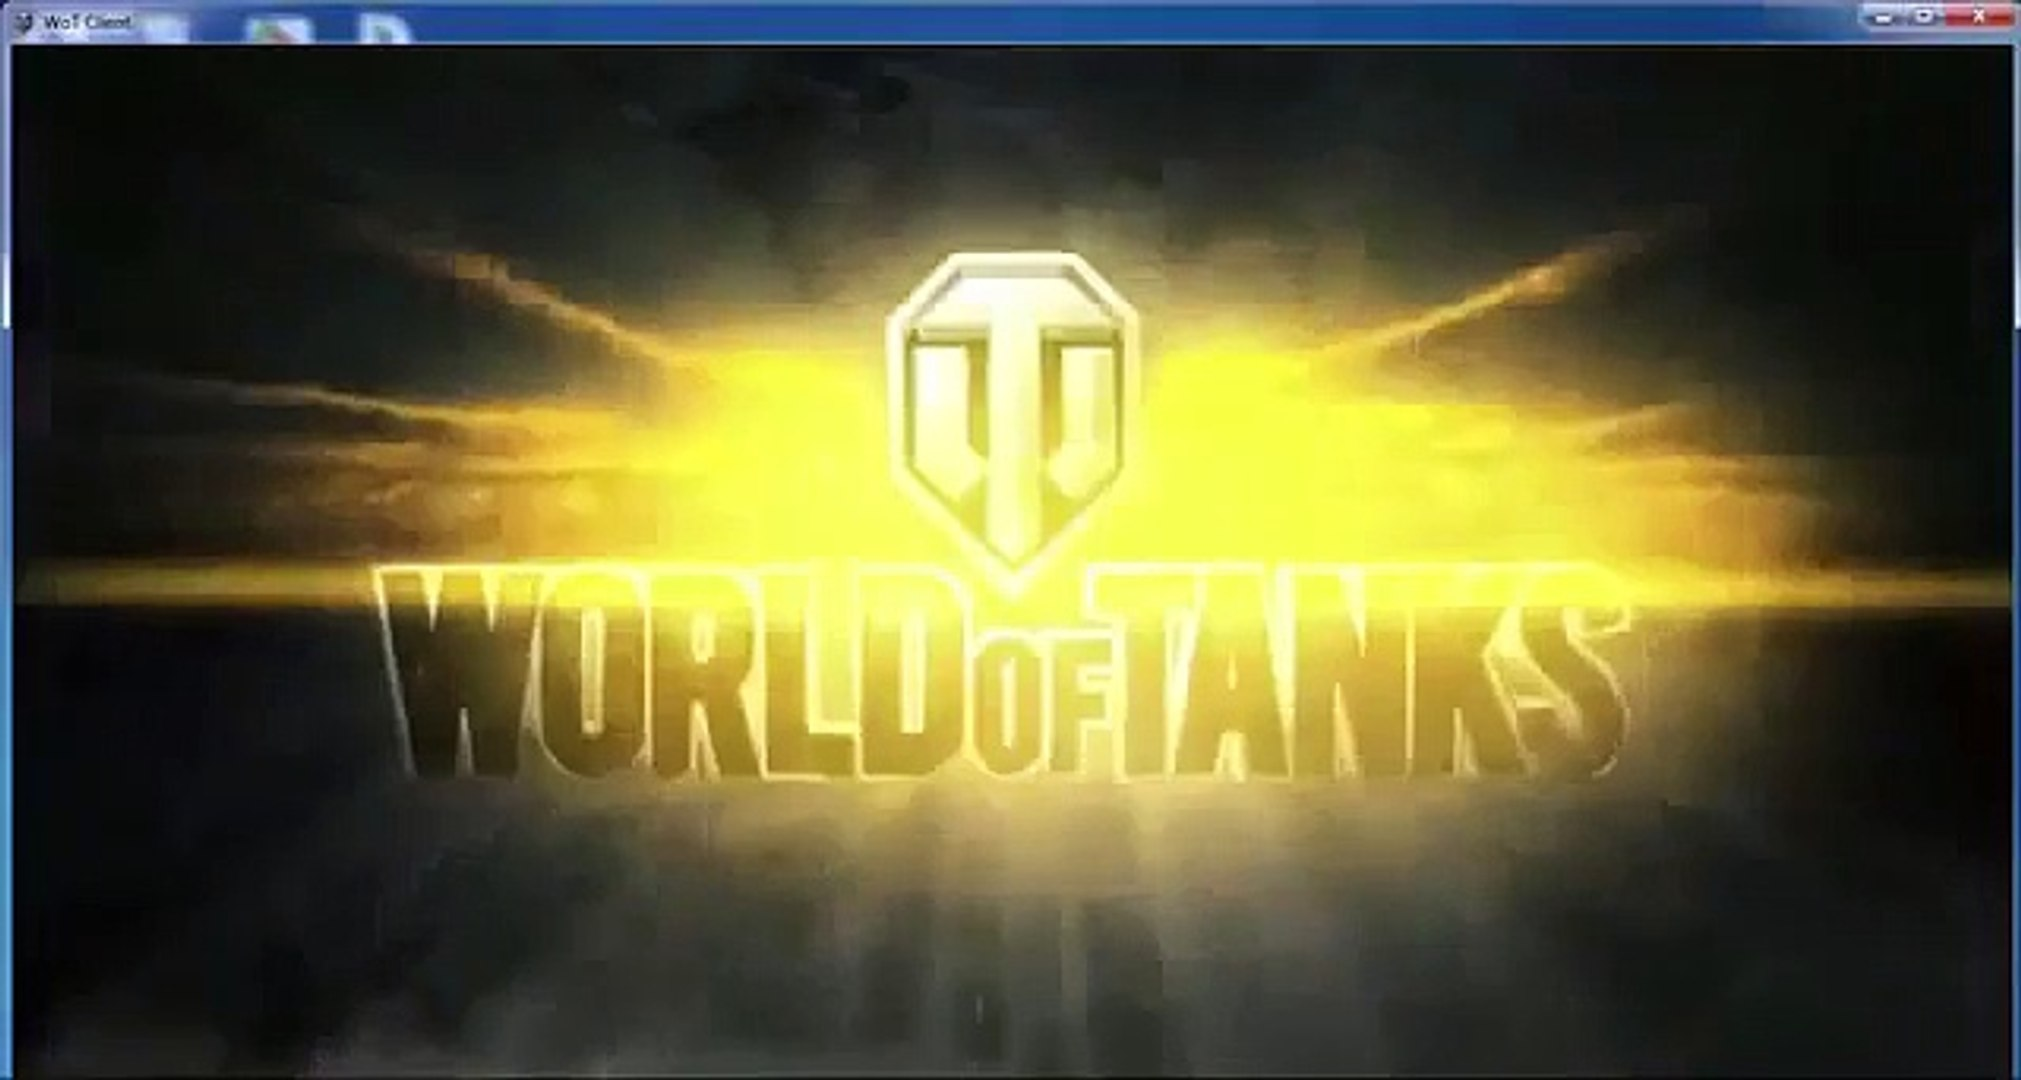 World of Tanks чит на золото, серебро, опыт и т д ! РАБОТАЕТ!